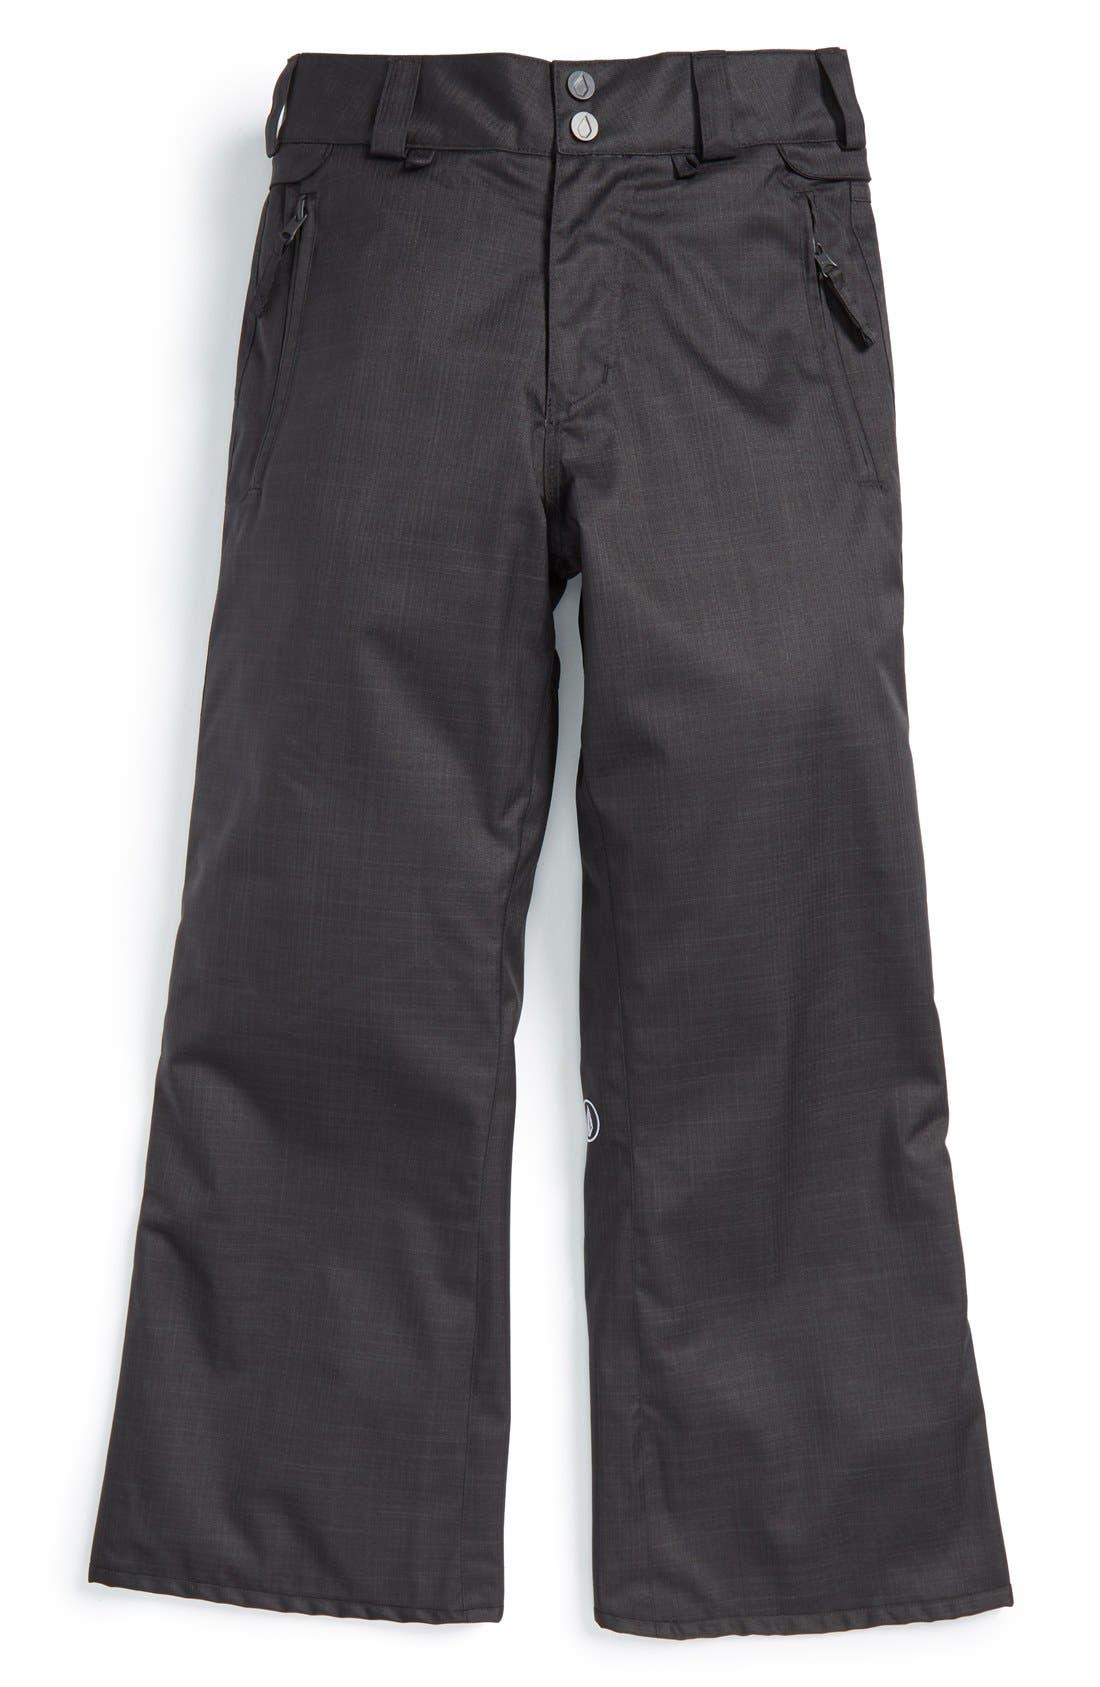 Volcom'Grimshaw' Insulated Snow Pants (Big Boys)